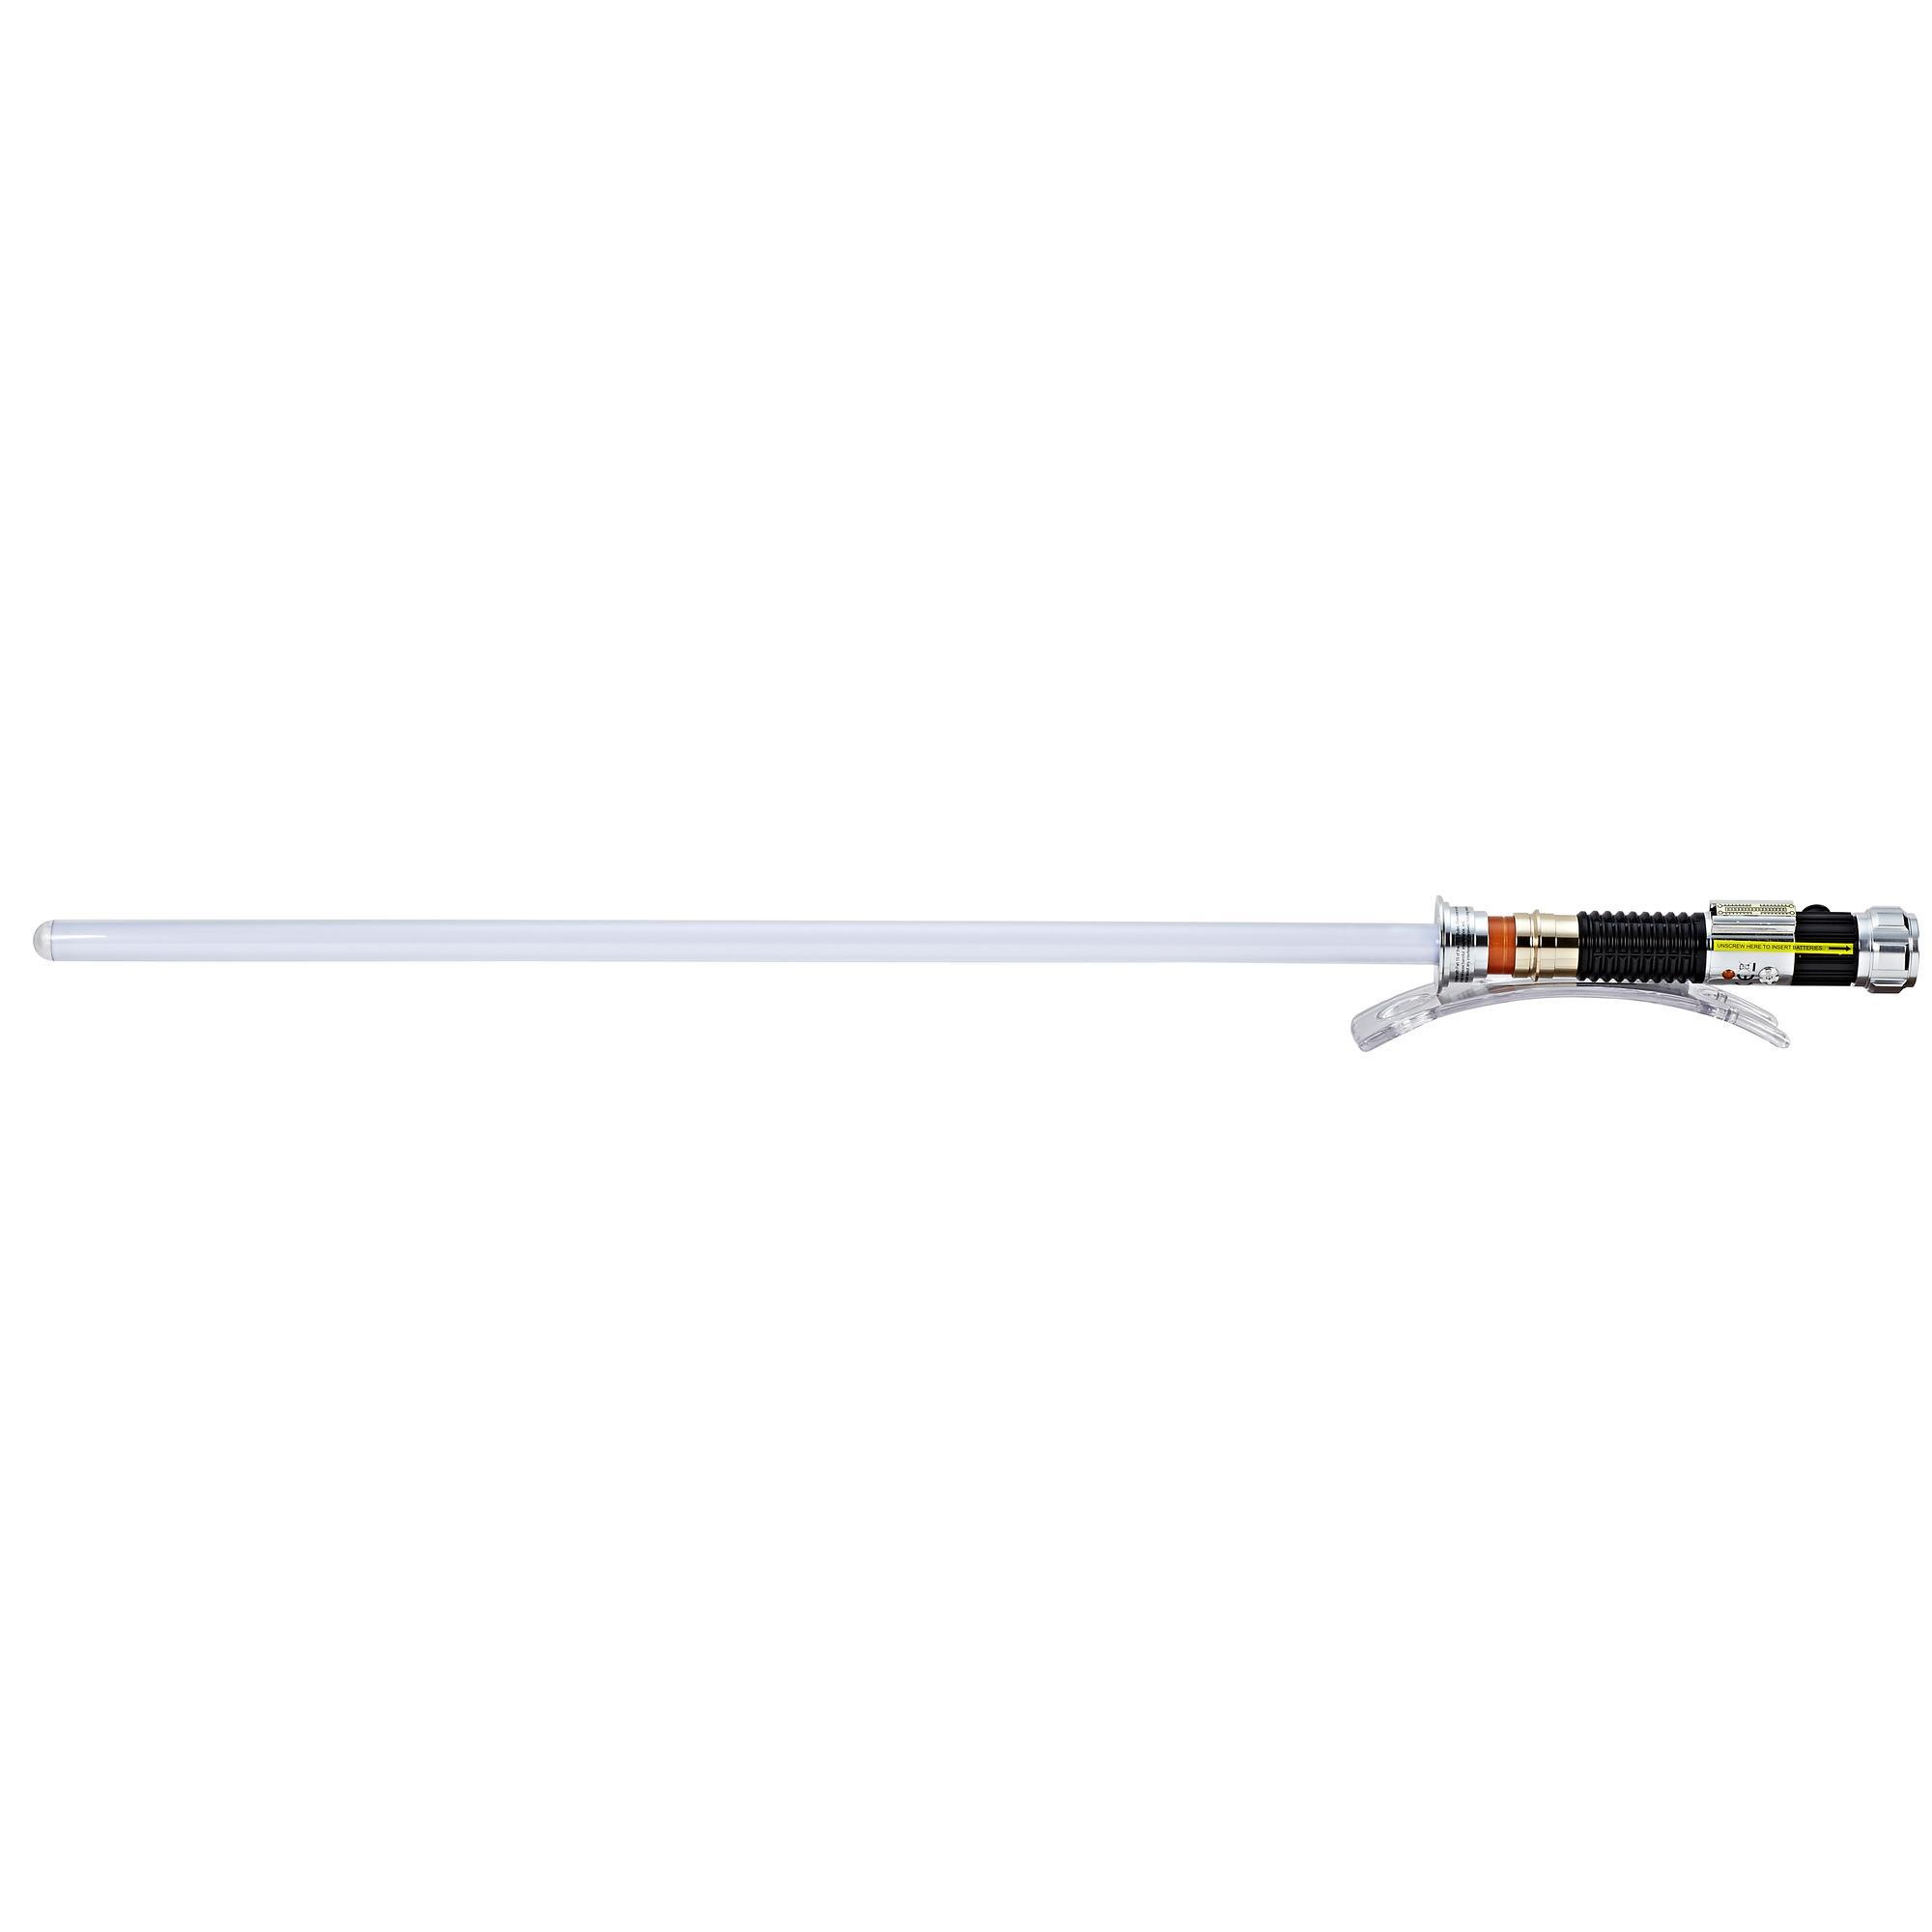 Star Wars Episódio IV The Black Series - Sabre de luz Force FX de Obi-Wan Kenobi